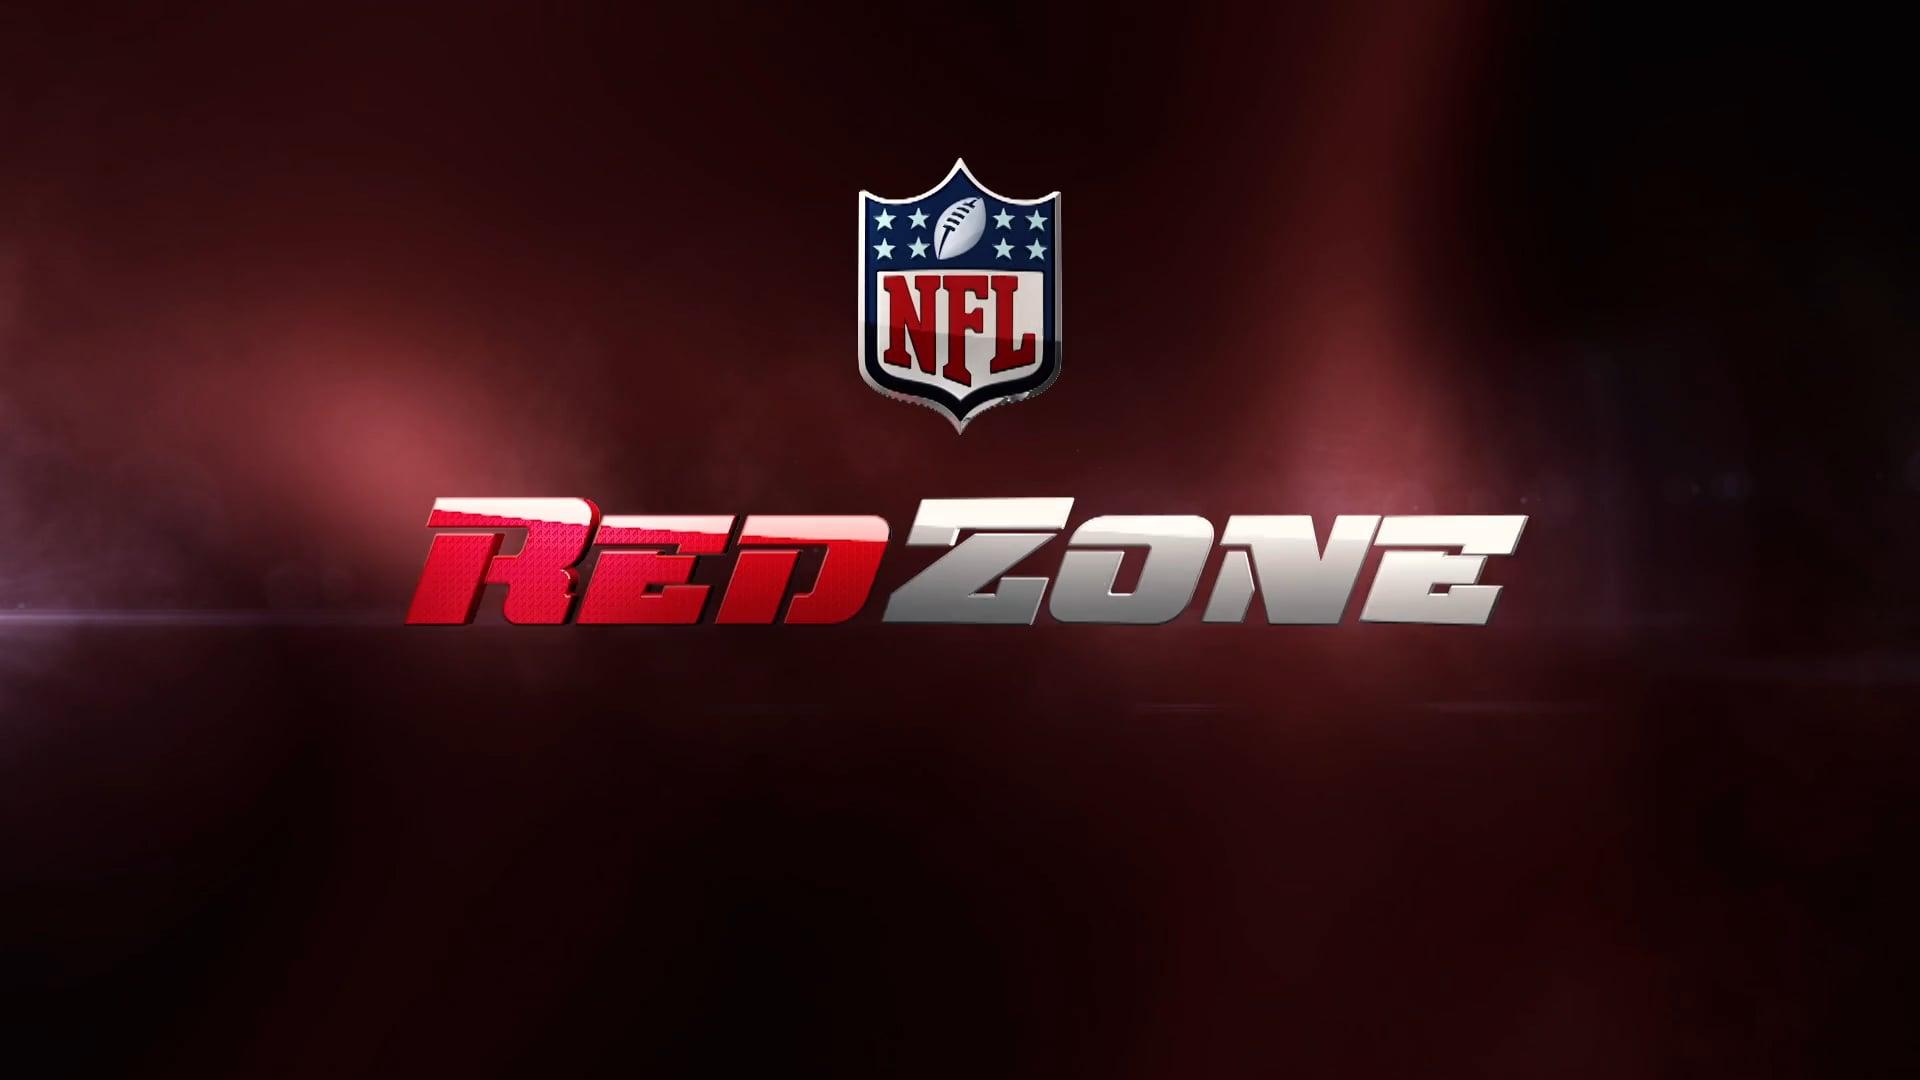 NFL Network Red Zone Swan Lake